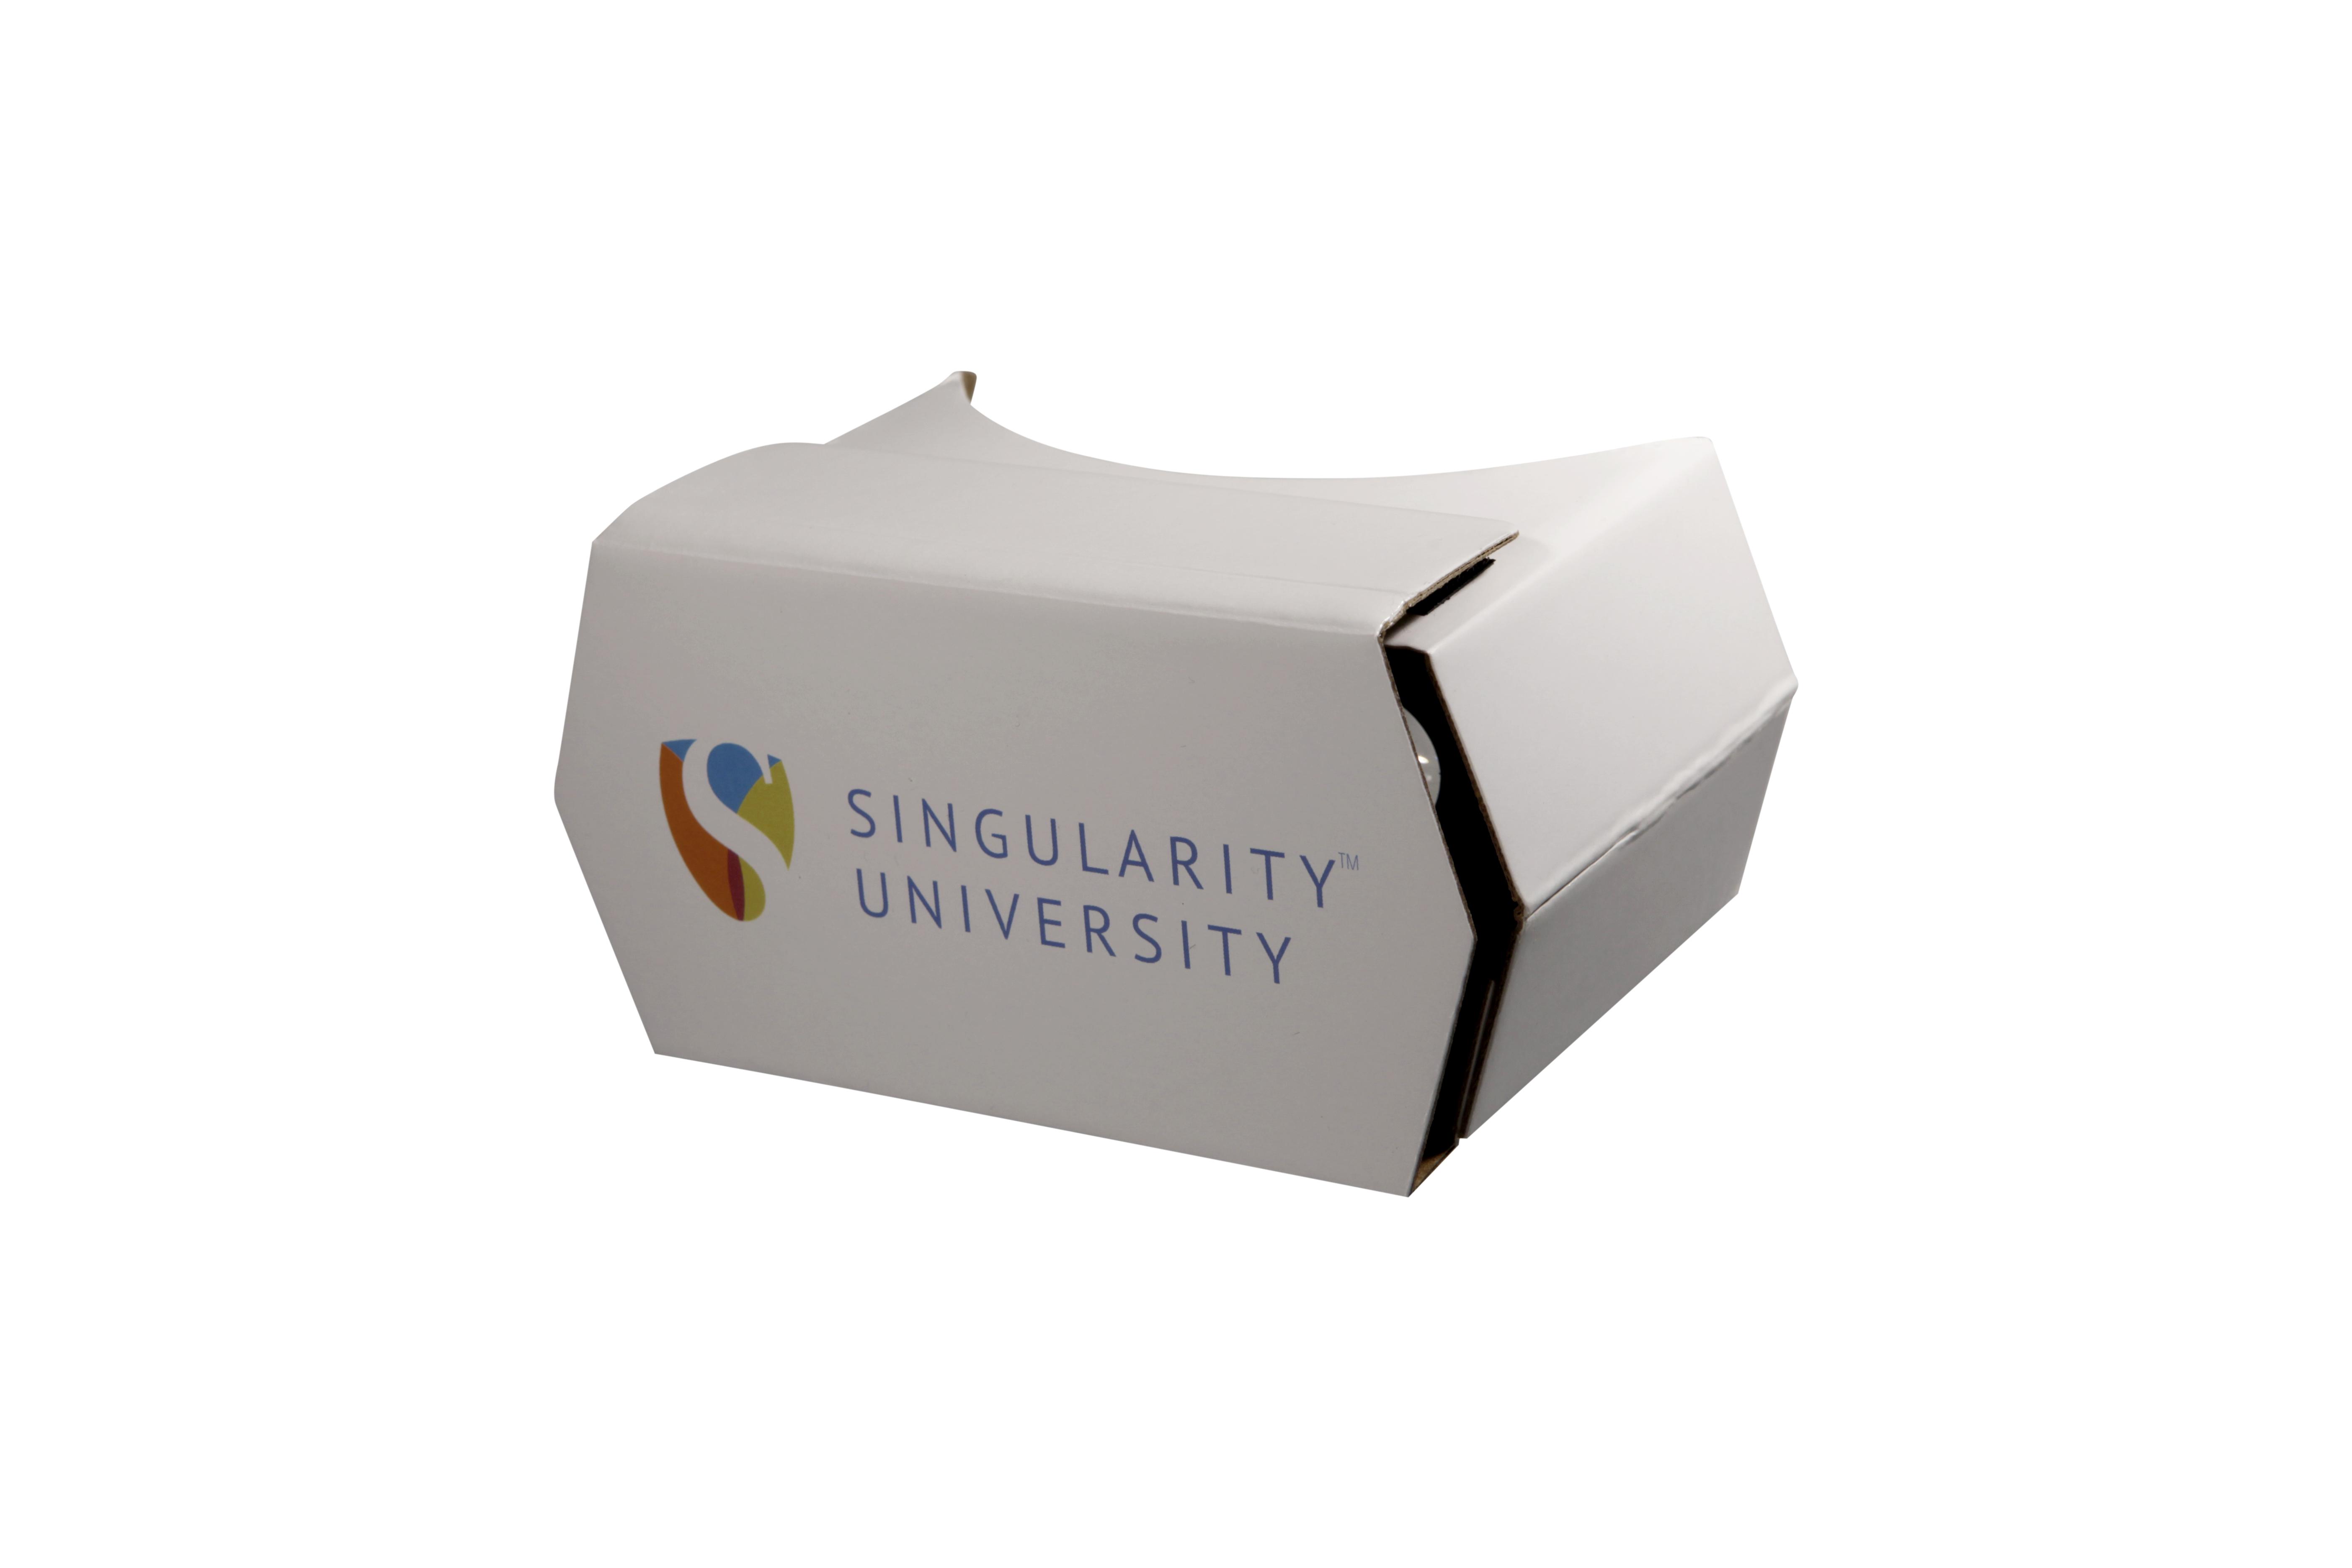 Singularity Uni